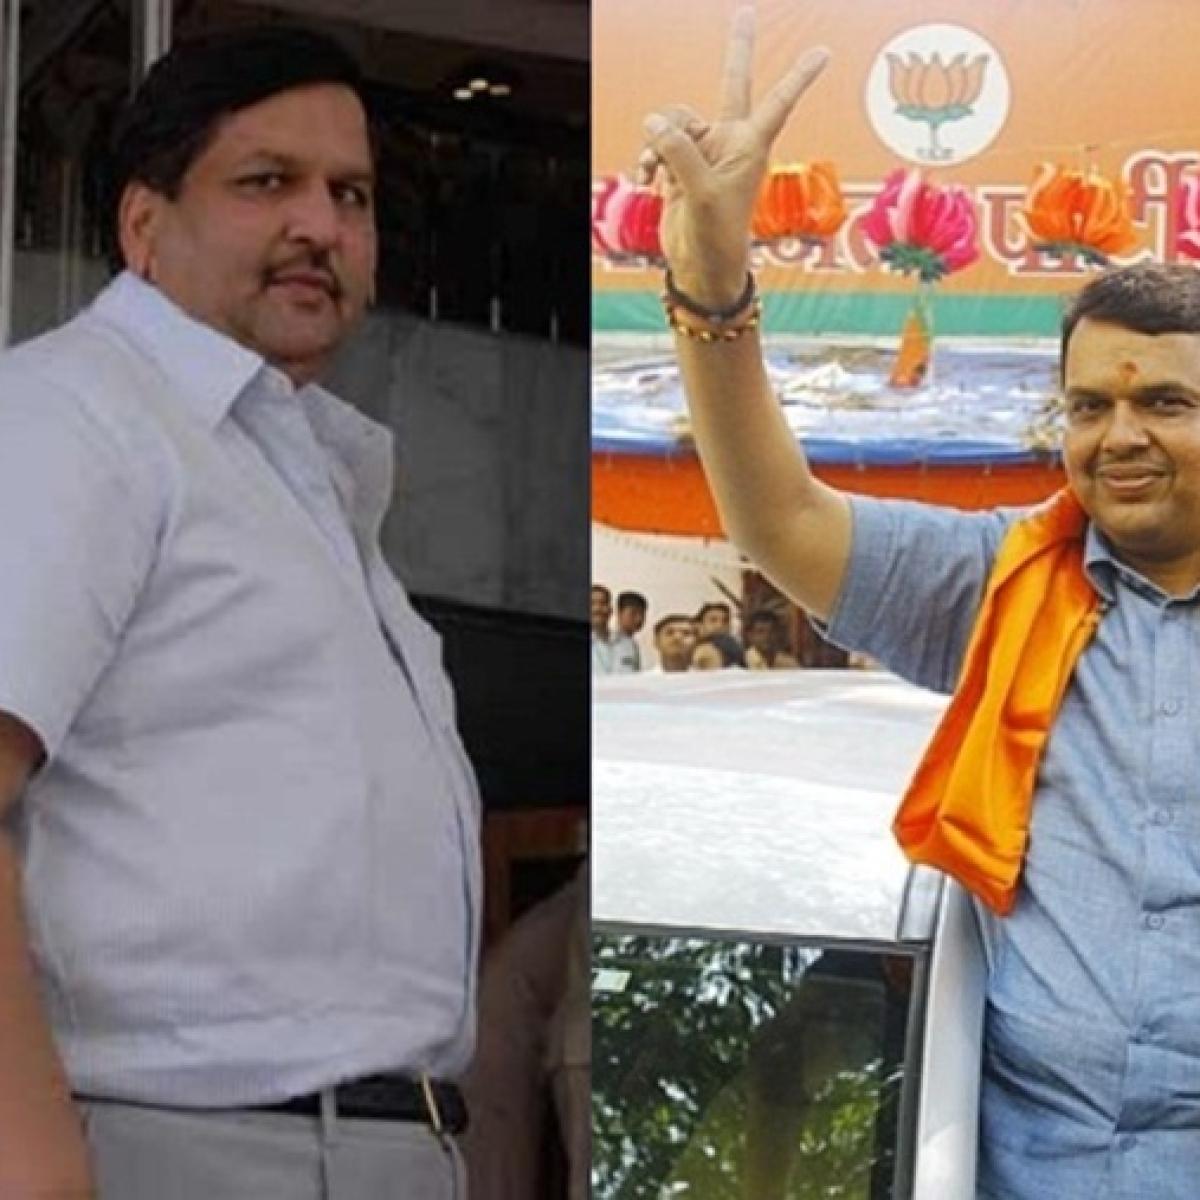 Maharashtra Election 2019 - Malabar Hill Assembly Constituency of Mumbai: BJP's Mangal Prabhat Lodha wins